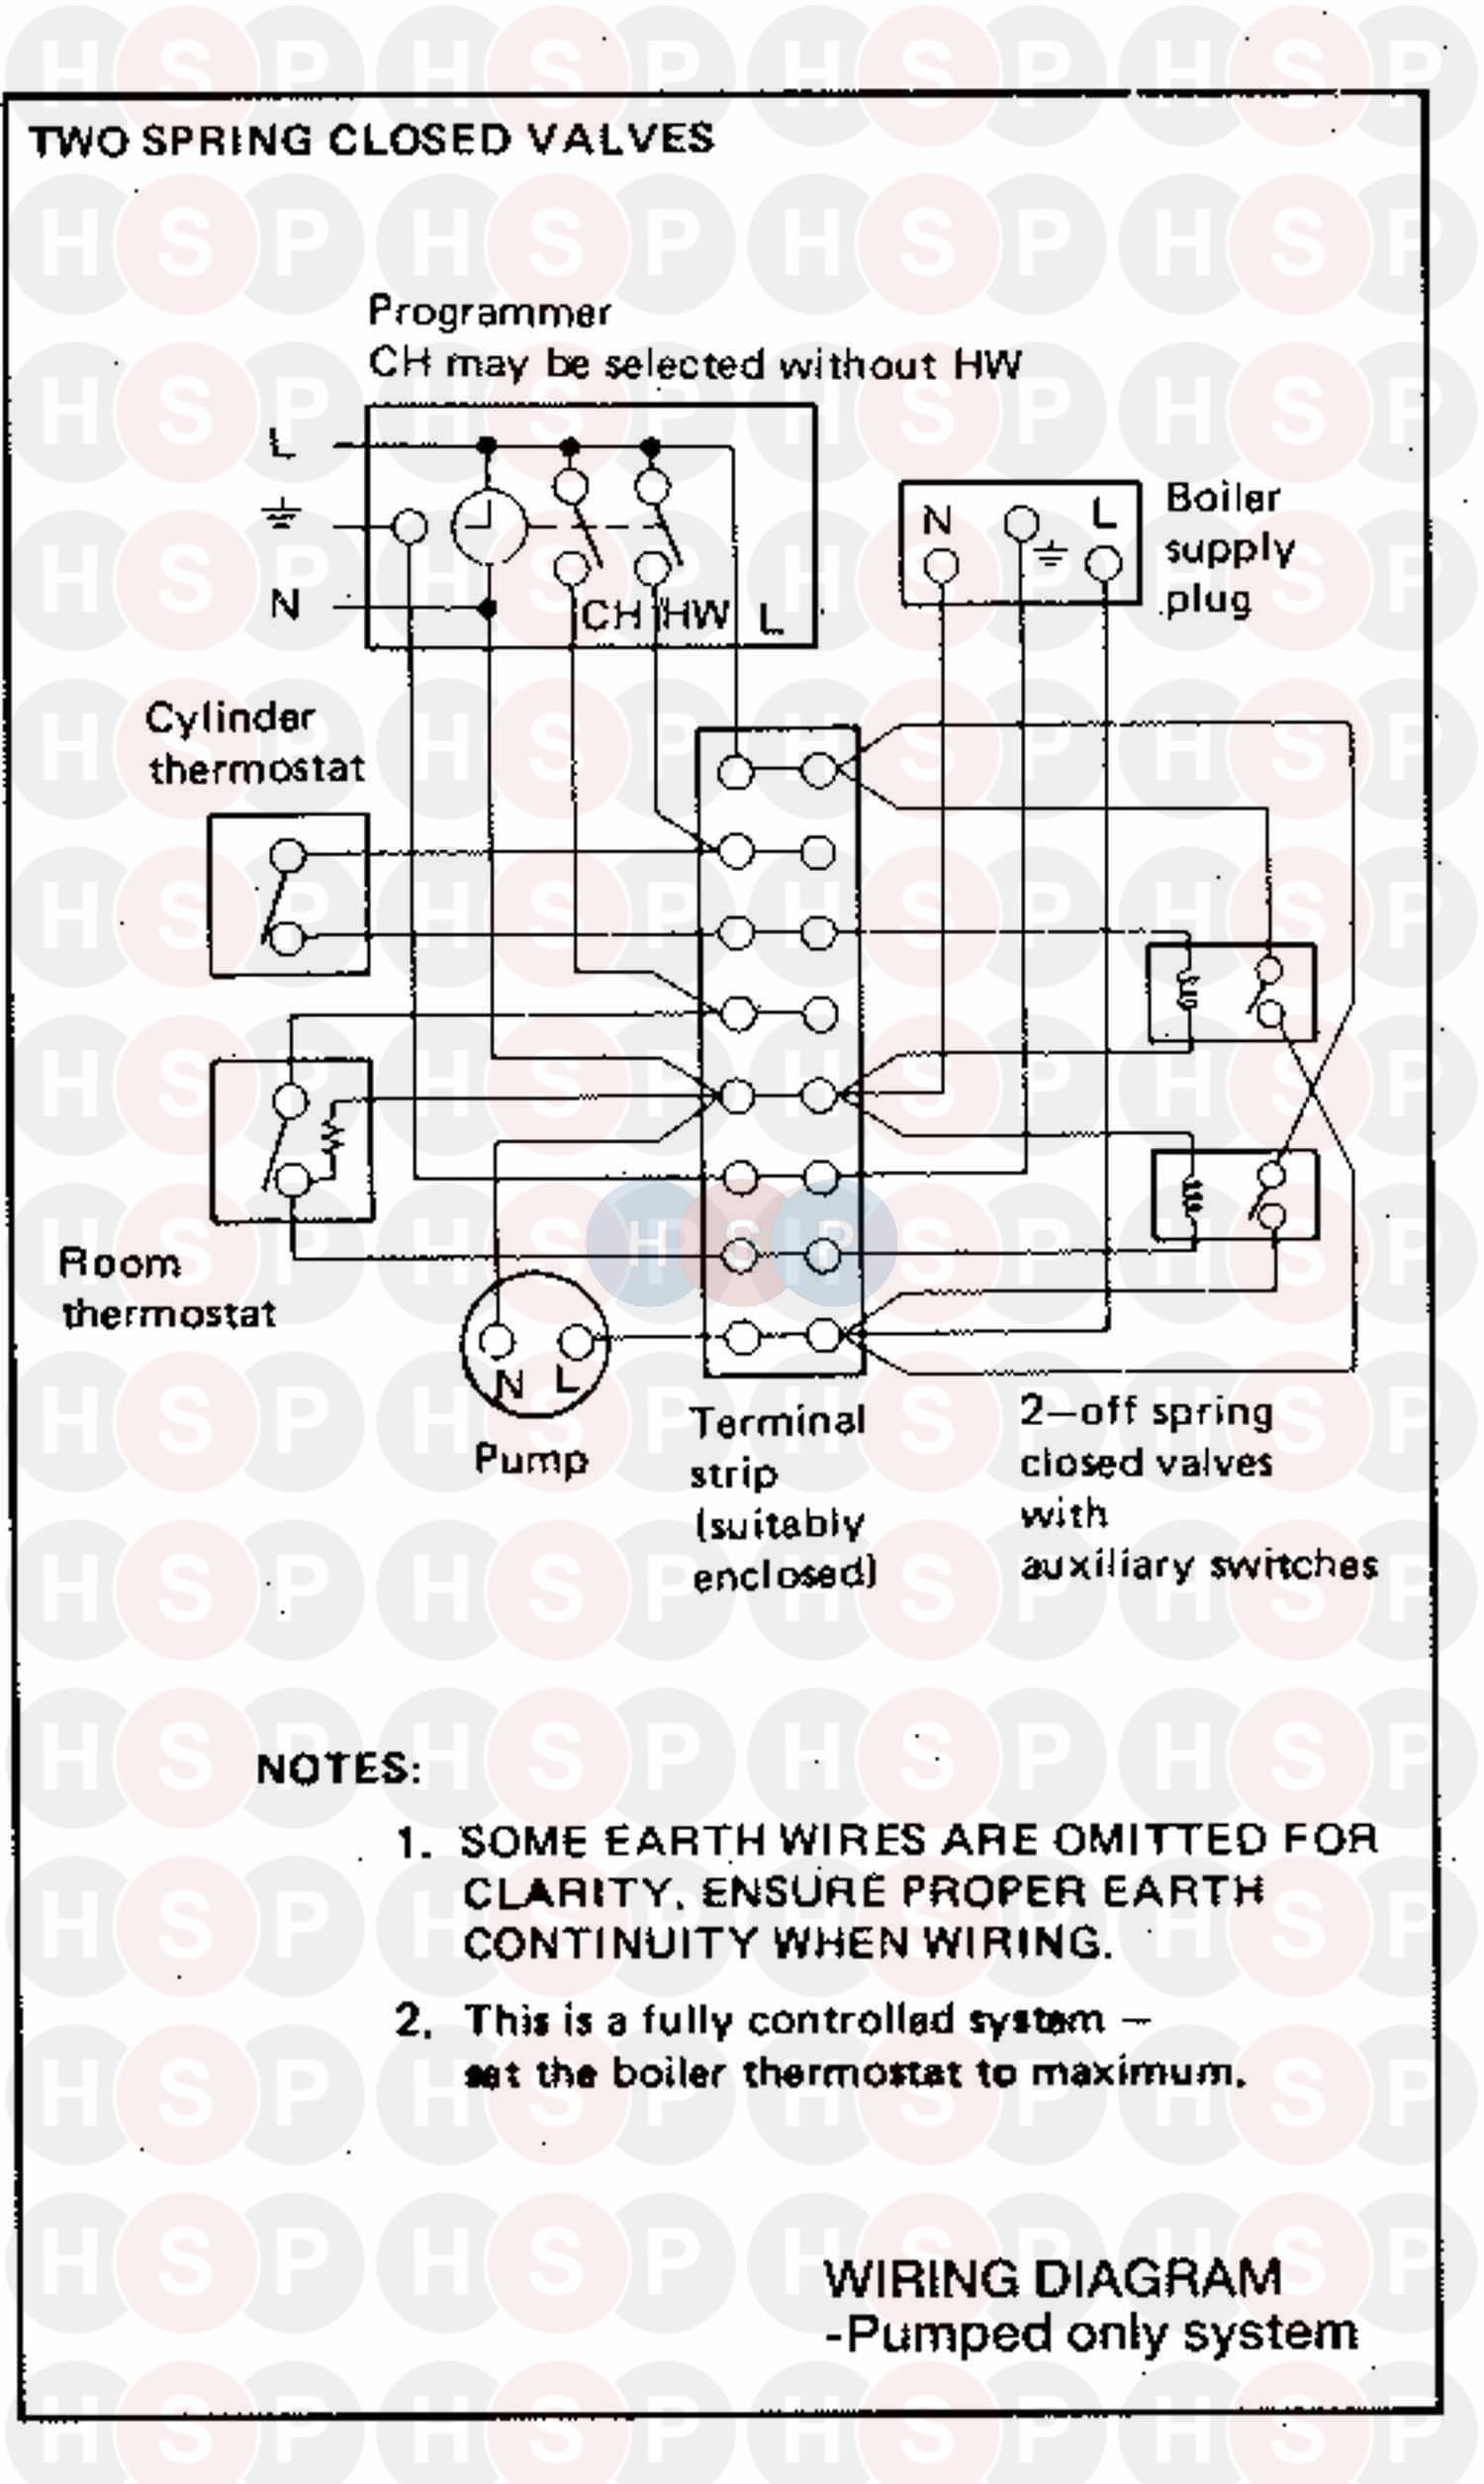 Ideal Concord Wlx Cf 60  Wiring Diagram 4  Diagram